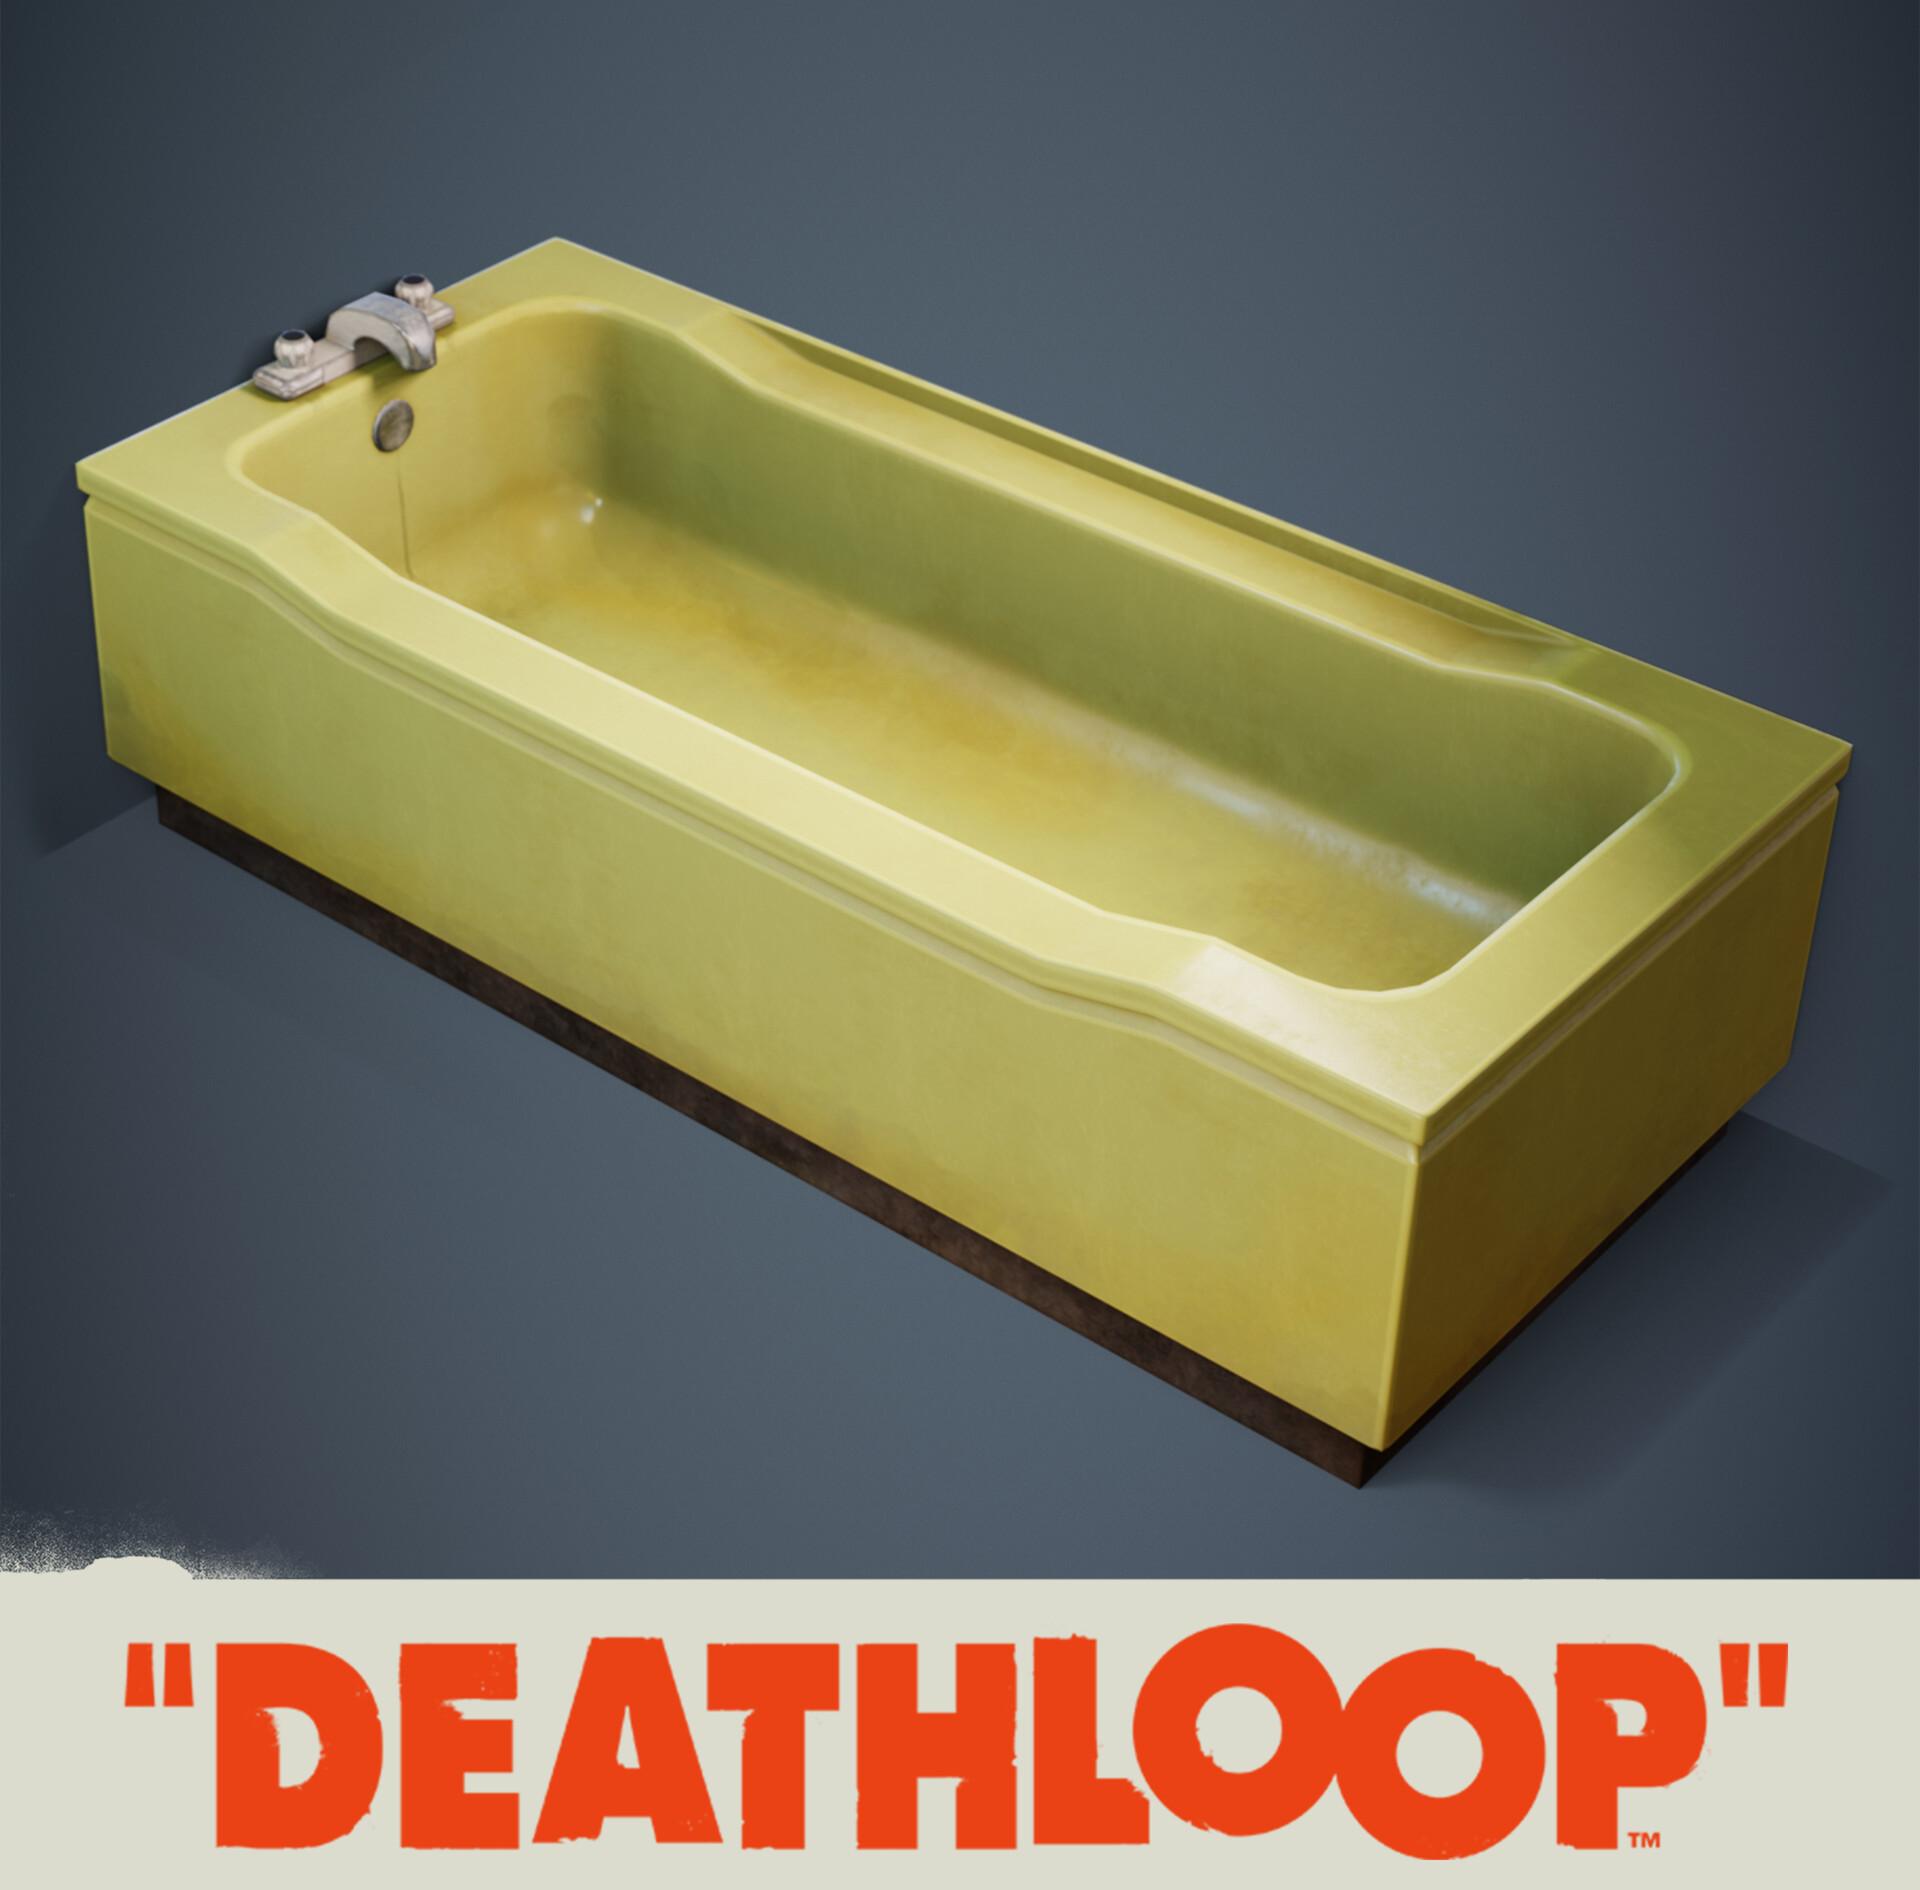 Bathroom: Deathloop Props